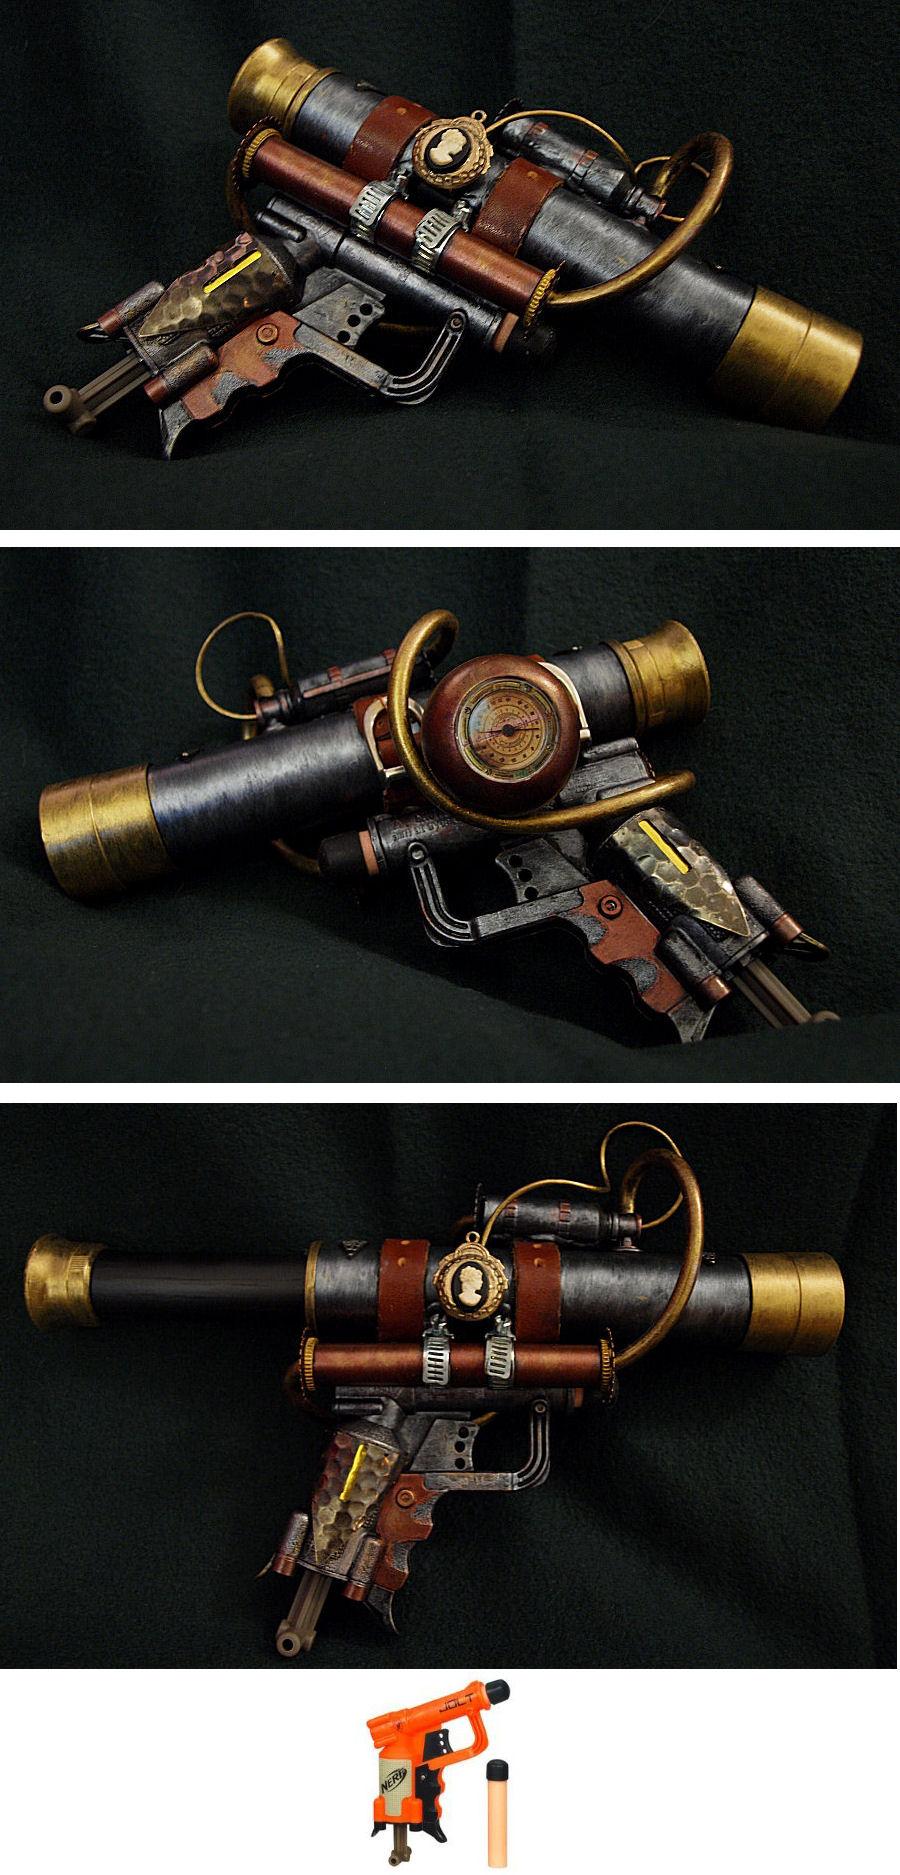 Steampunk Telescopic Pistol by ajldesign